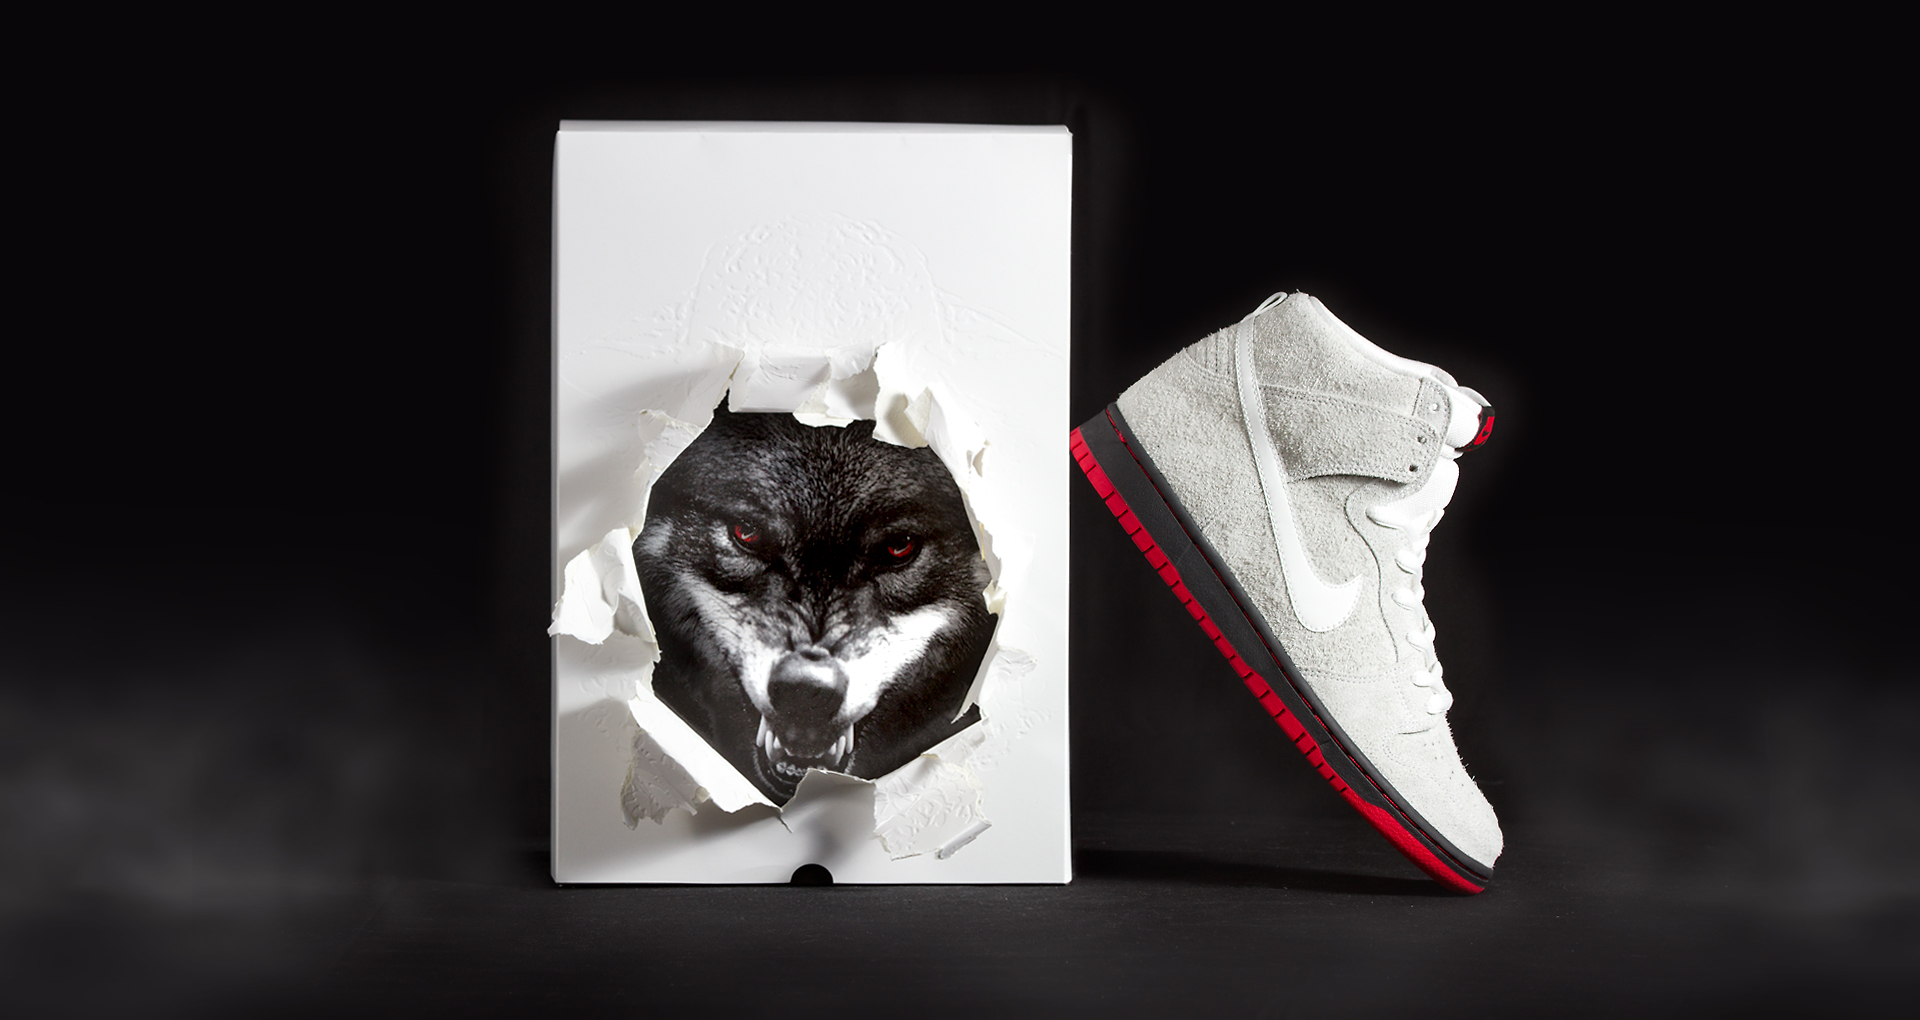 NikeSB_DunkHi_BlackSheep_hero2boxfog